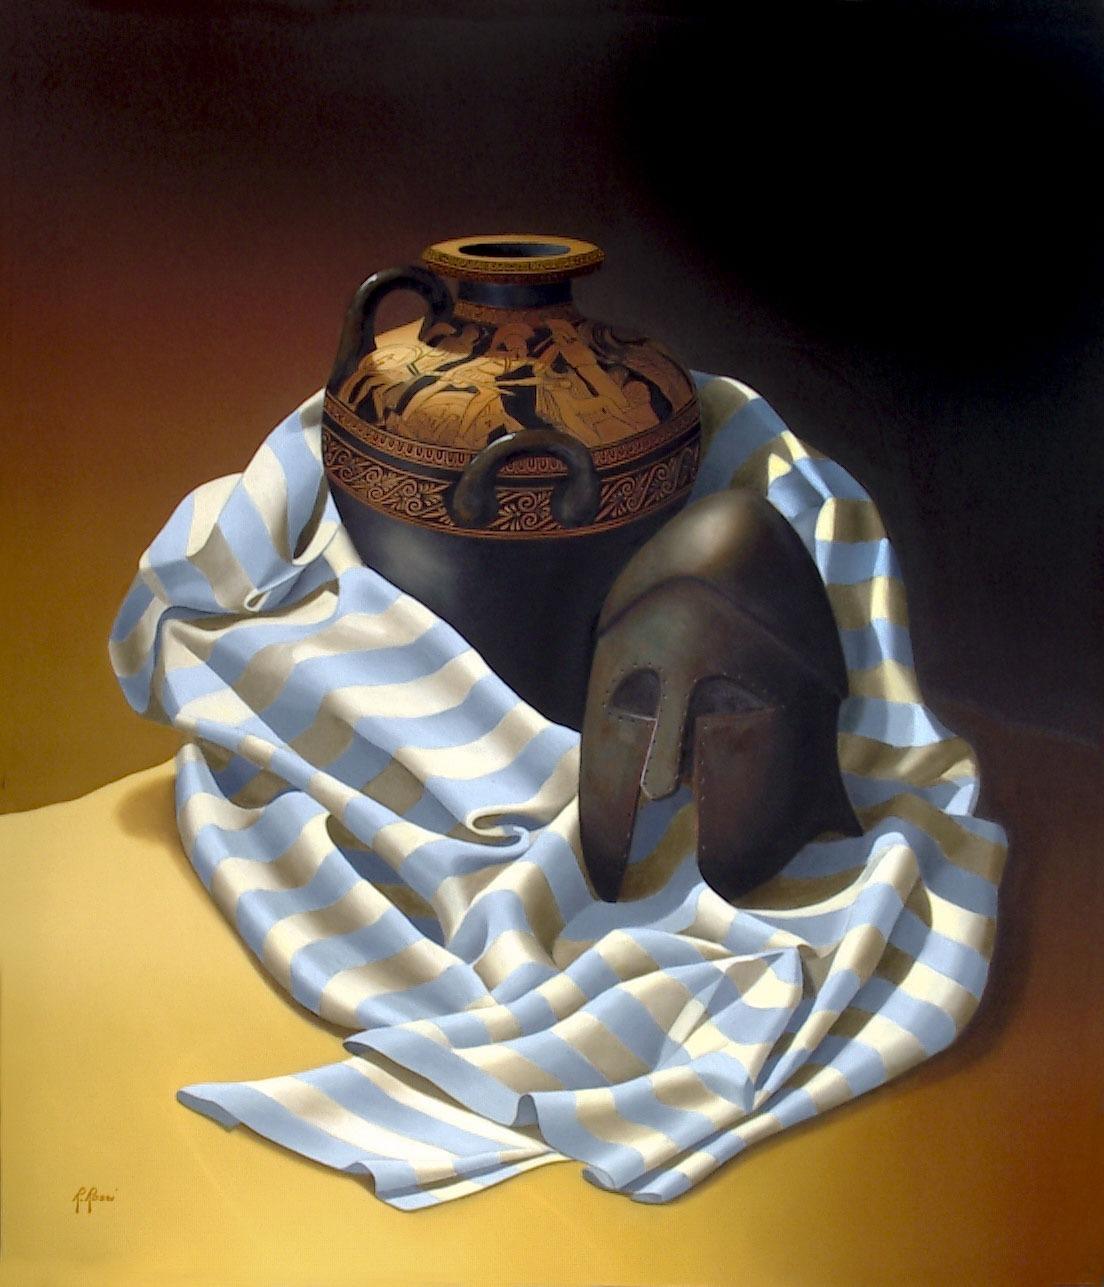 2007 roberta rossi - Aiace e Cassandra - olio su tela - 70 x 60